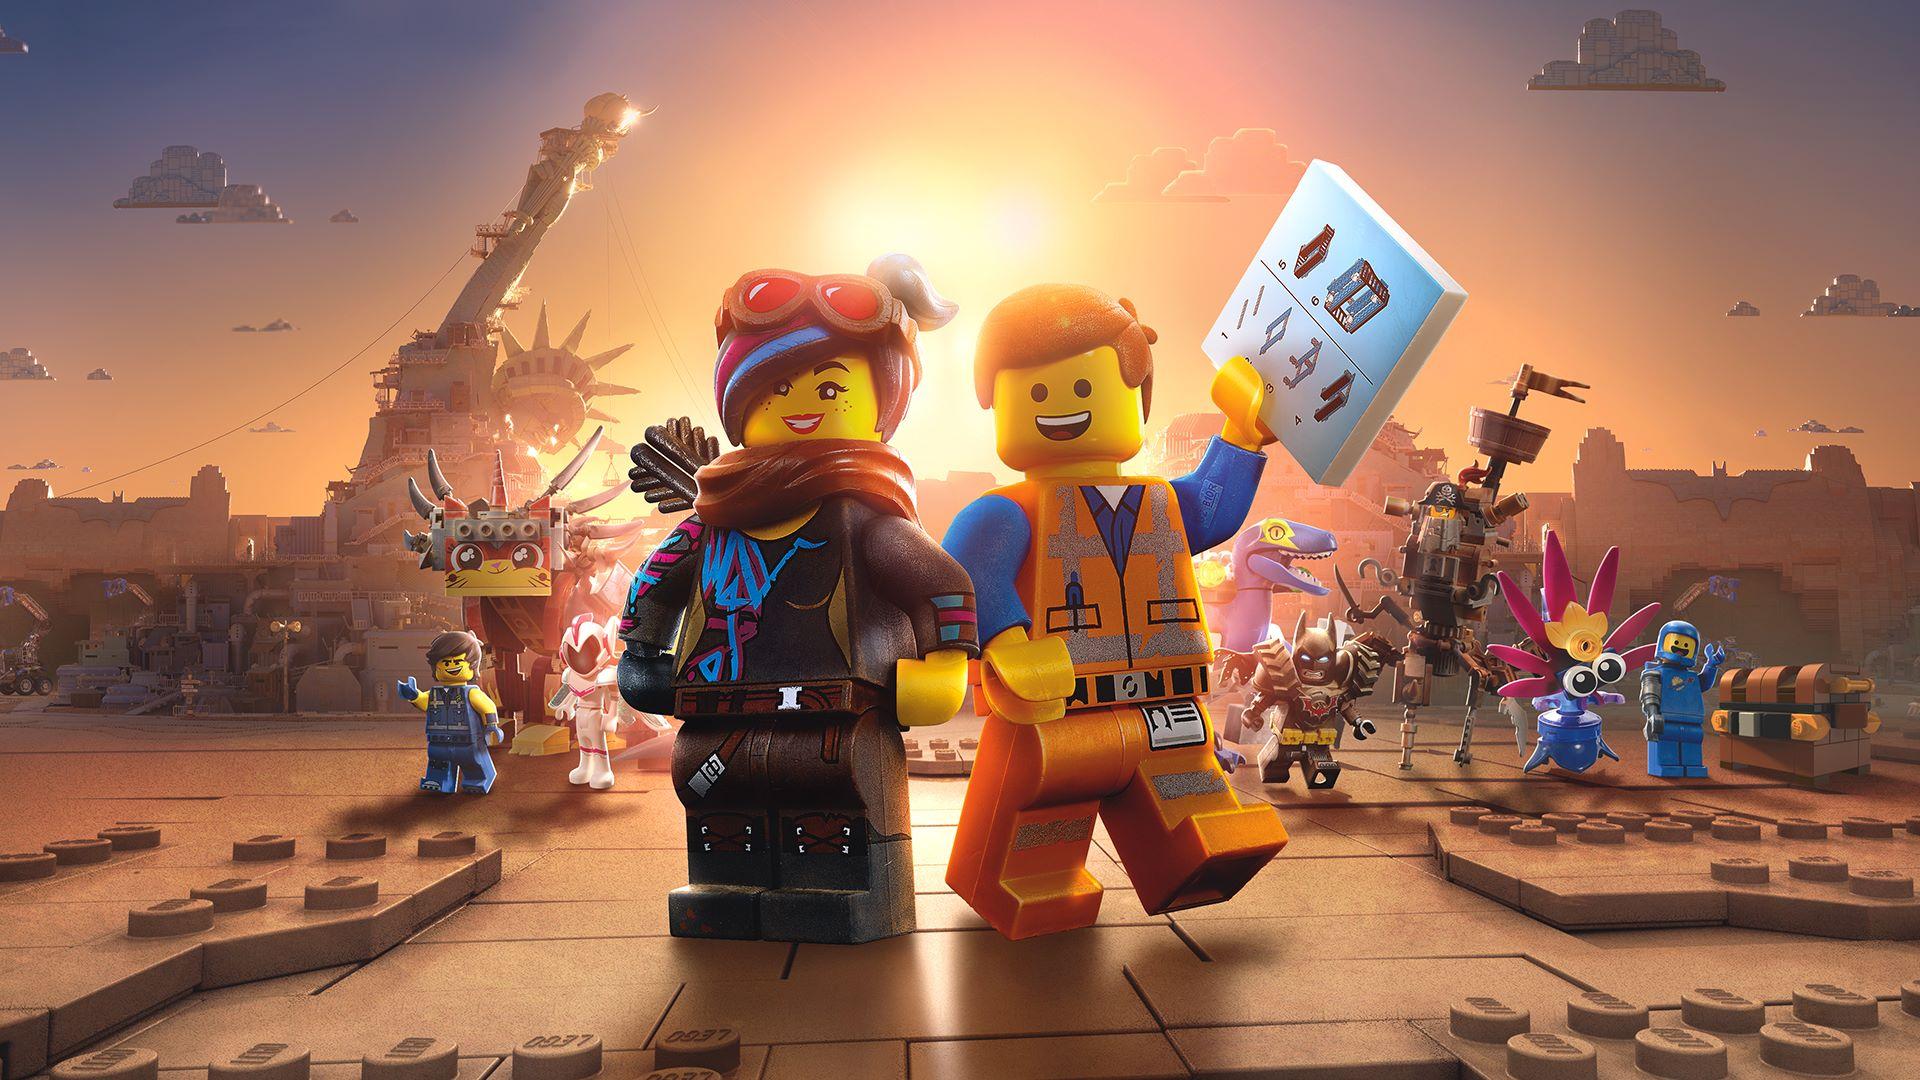 lego_movie_2.jpg (312.23 Kb)